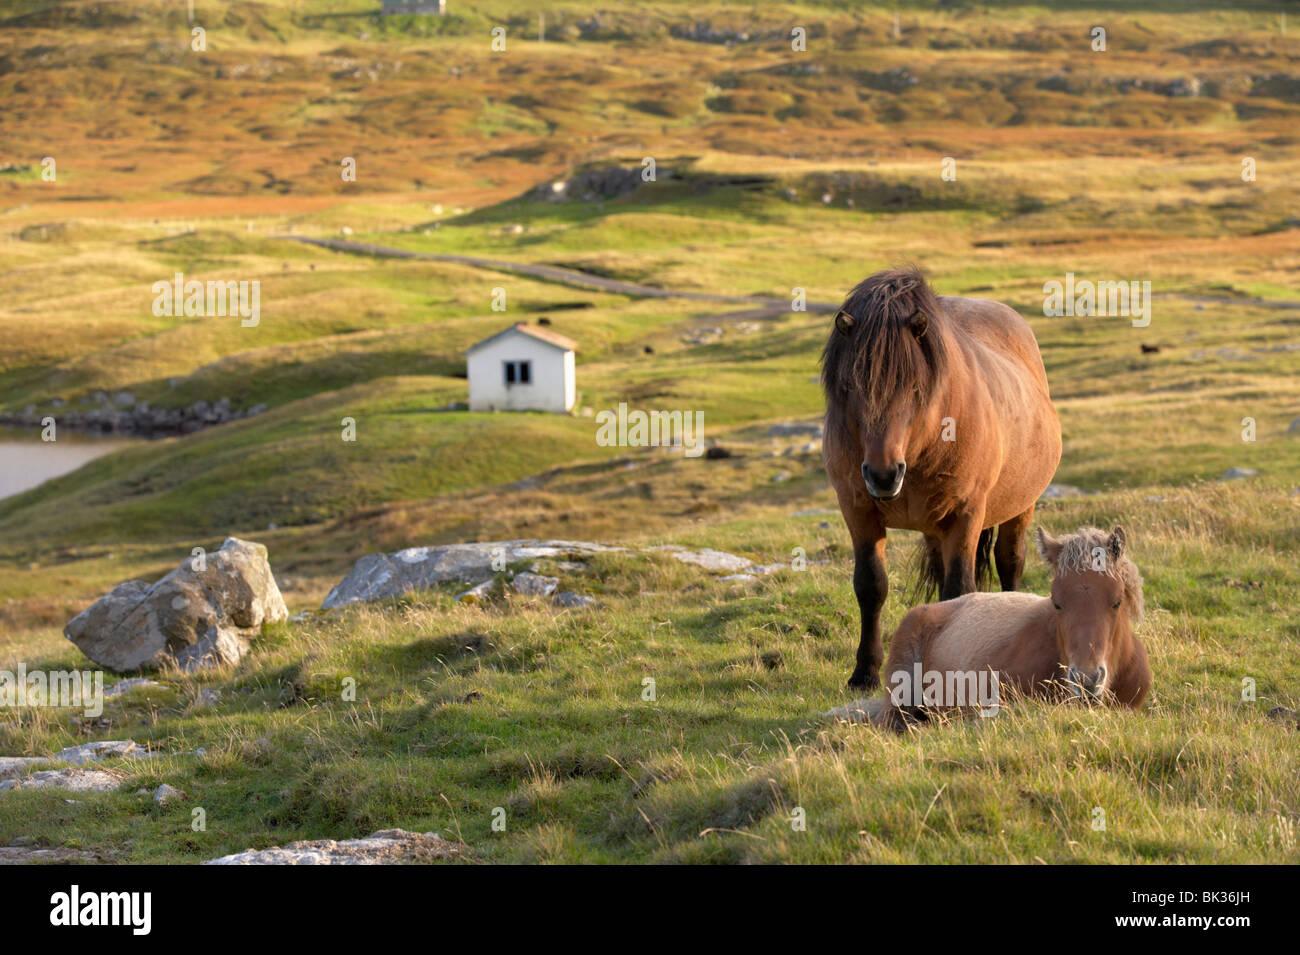 Horses, stallion and foal, Sandoy island, Faroe Islands, Denmark, Europe - Stock Image